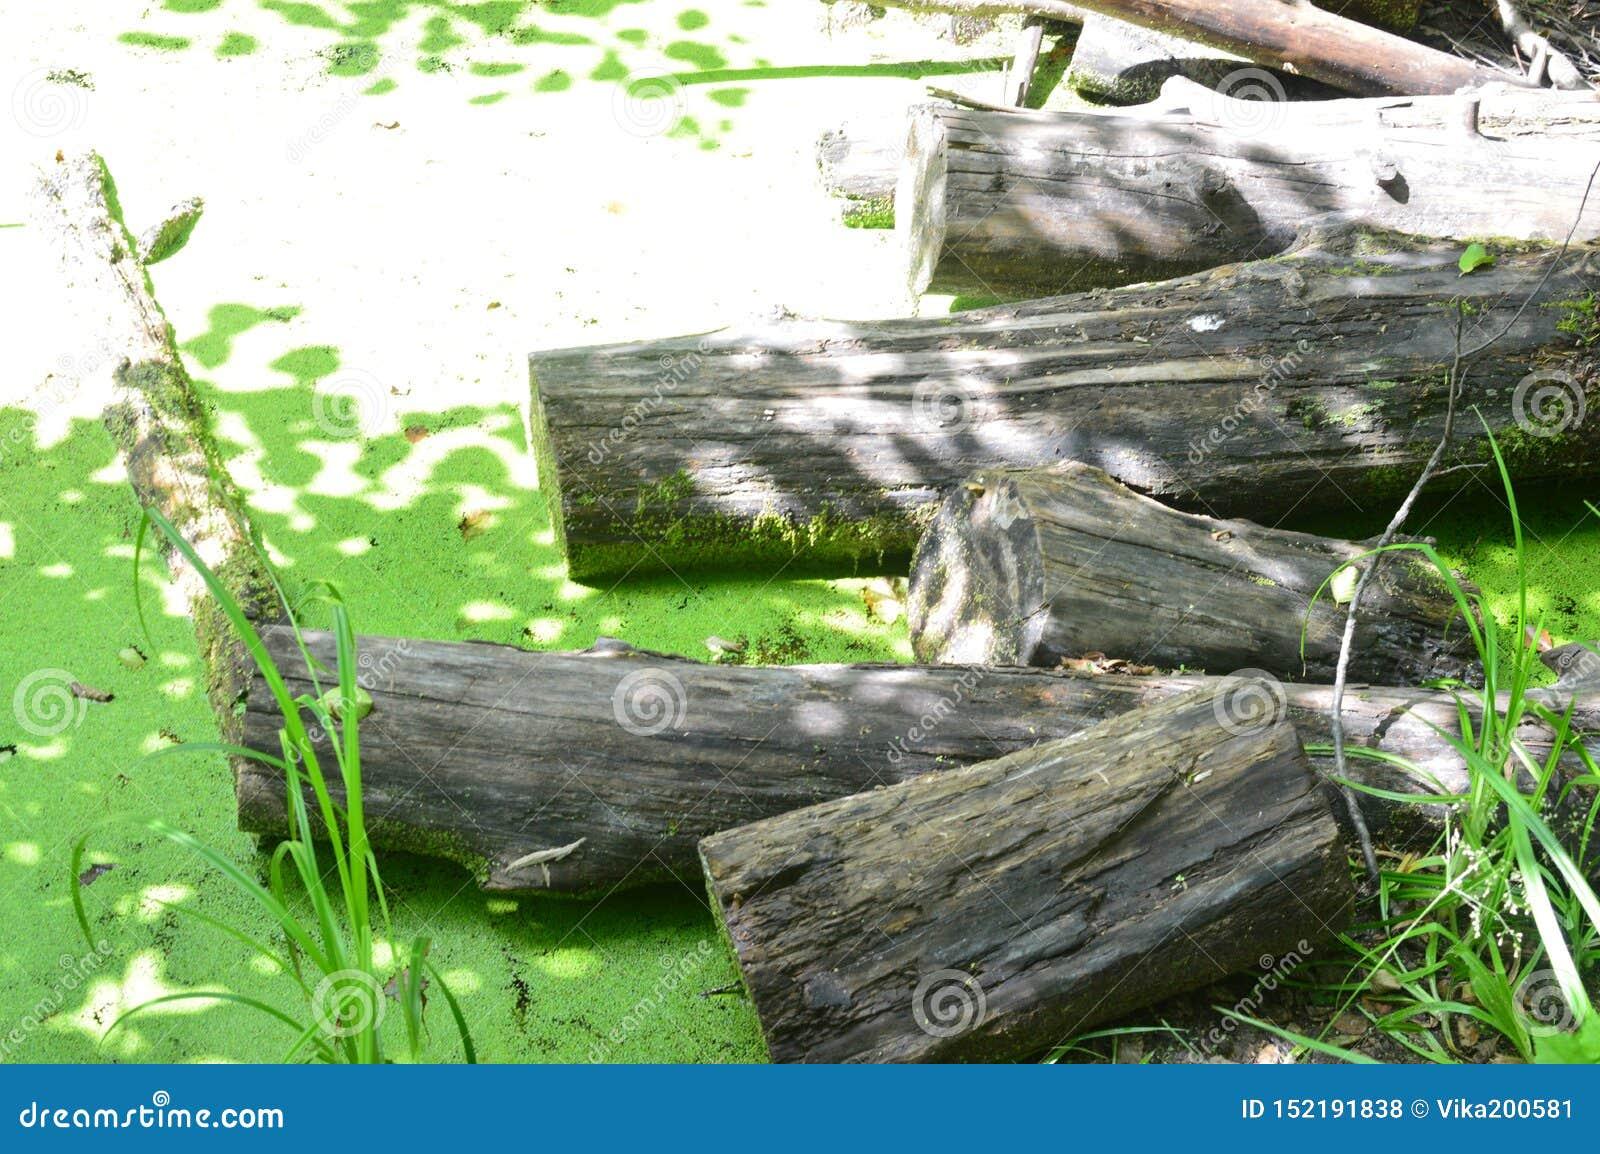 Green swamp marshland landscape. Beaver platinum. Swamp trees bog backwater view